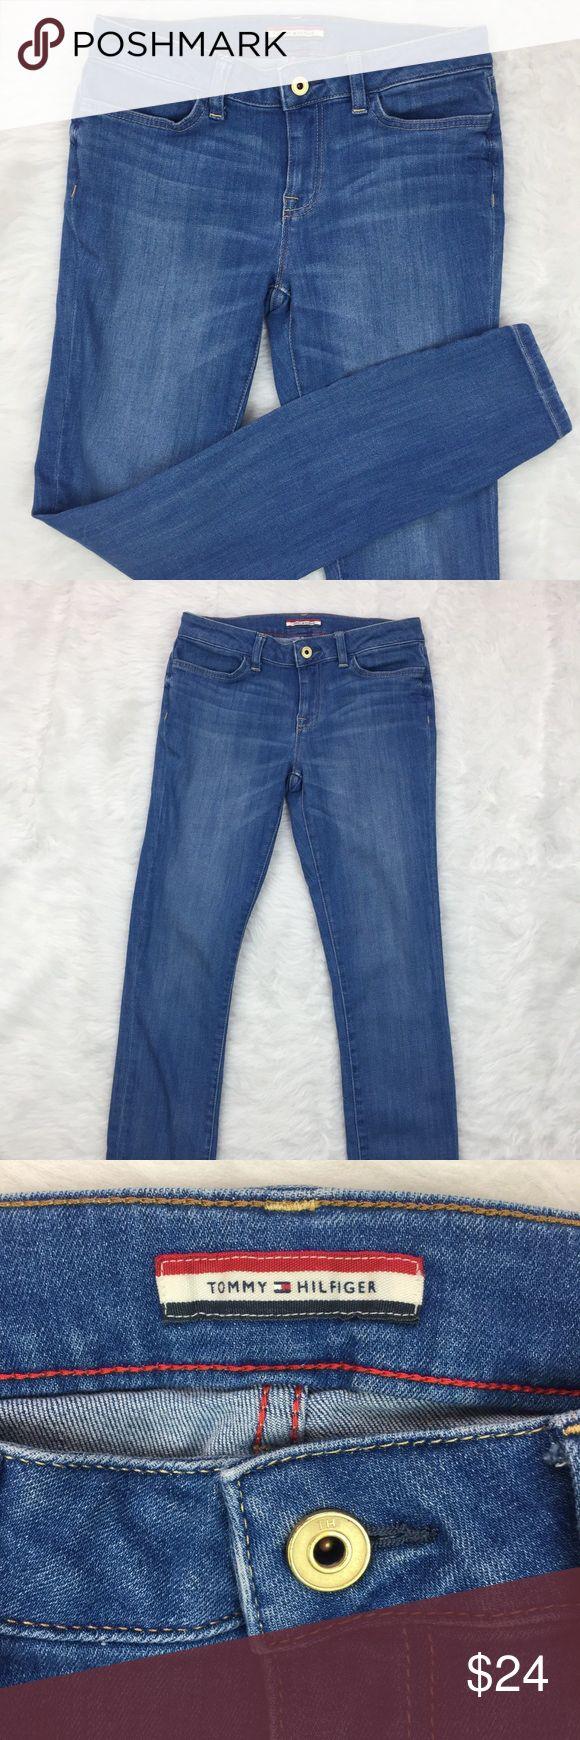 "TOMMY HILFIGER legging jeans Tommy Hilfiger legging jeans, form fitting, medium wash, 30"" inseam, excellent condition.    (030) Tommy Hilfiger Jeans Skinny"